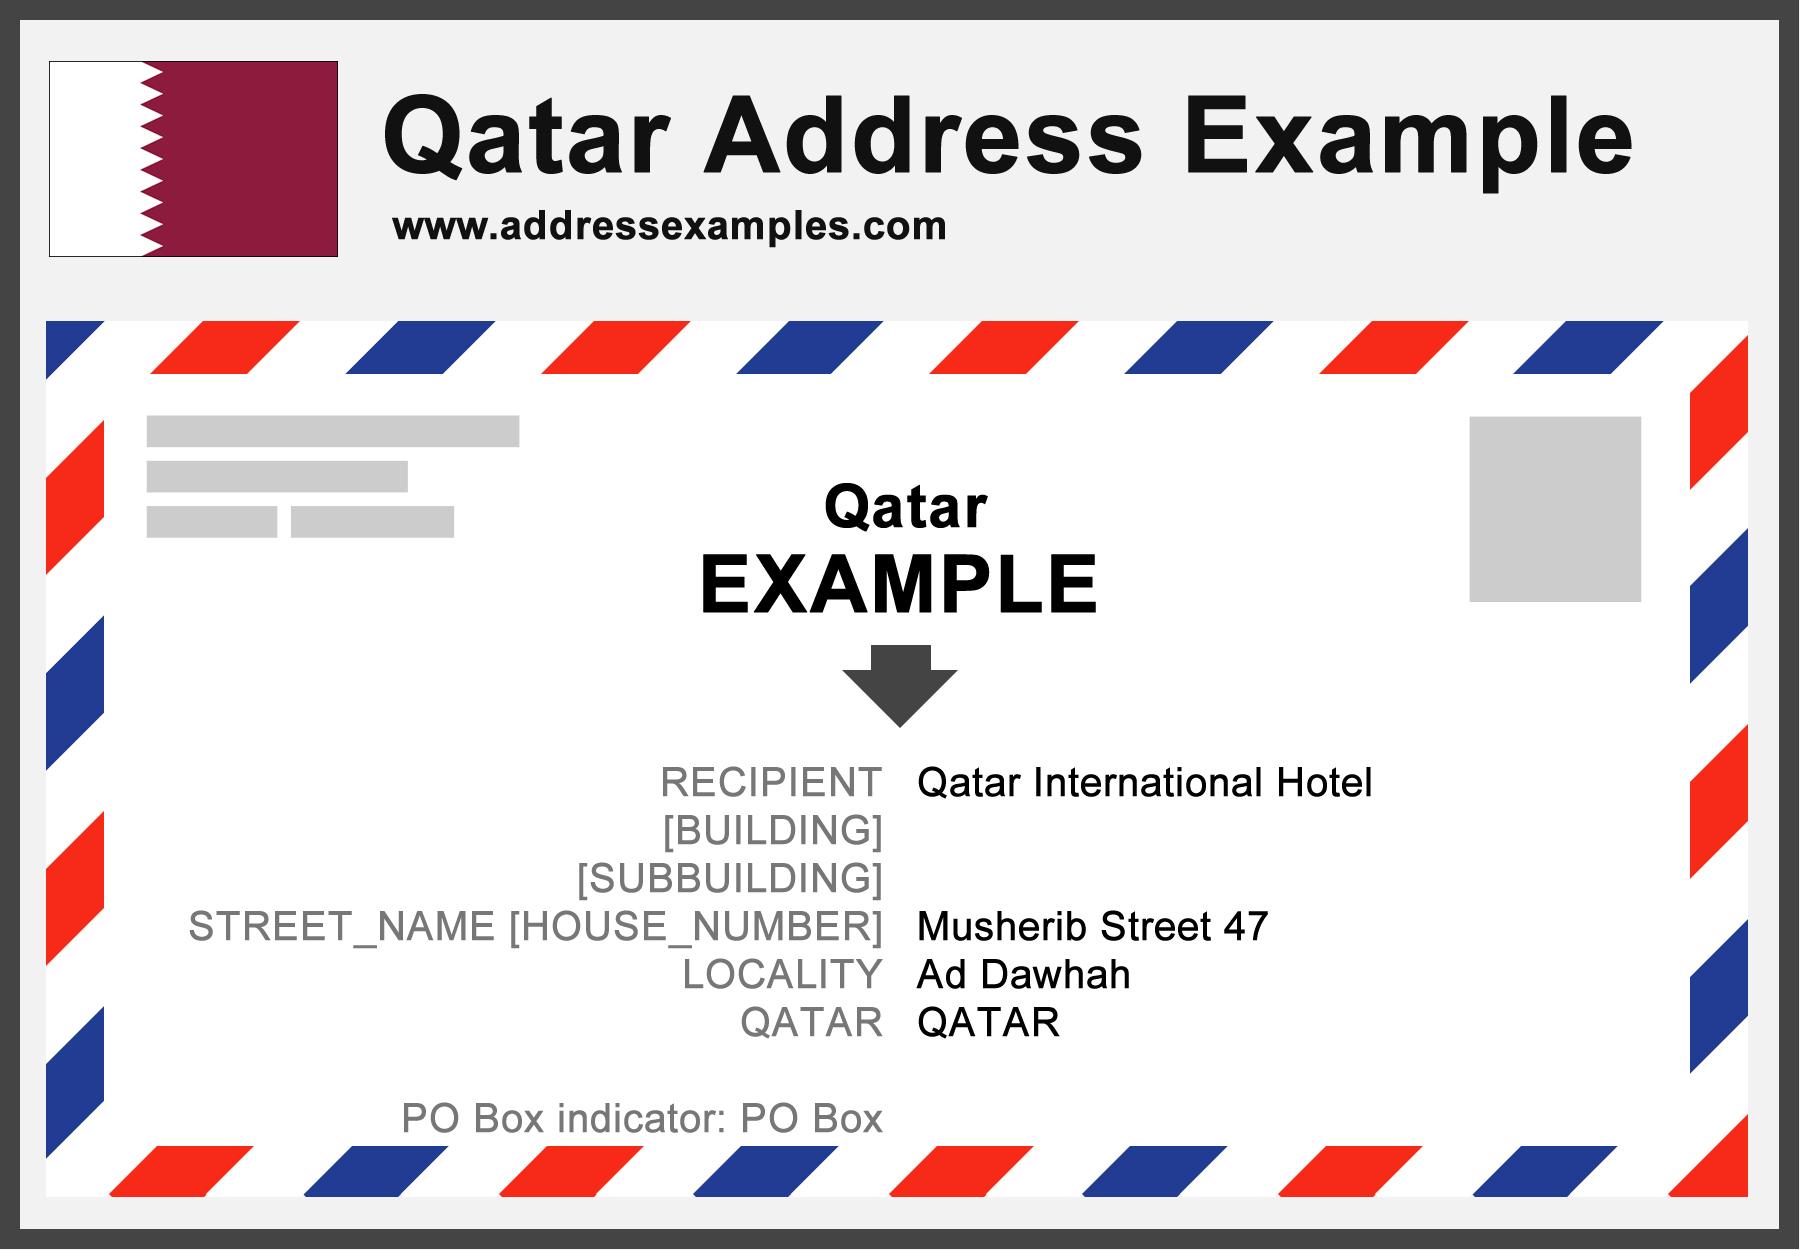 Qatar Address Example